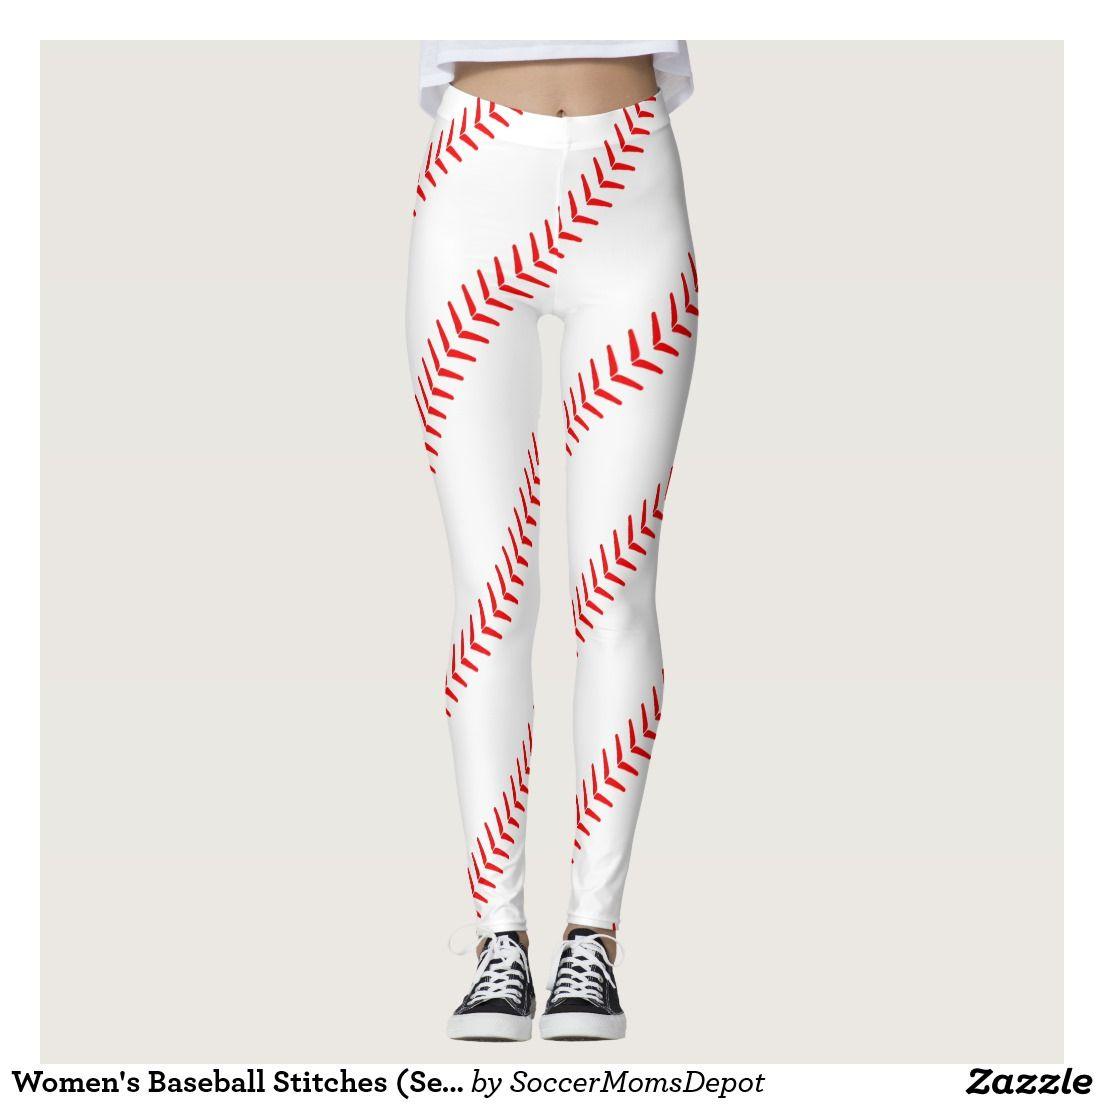 5f6e95adb304b Women's Baseball Stitches (Seams) White Leggings #baseball #leggings  #baseballoutfit #baseballleggings #baseballmom #baseballgirl